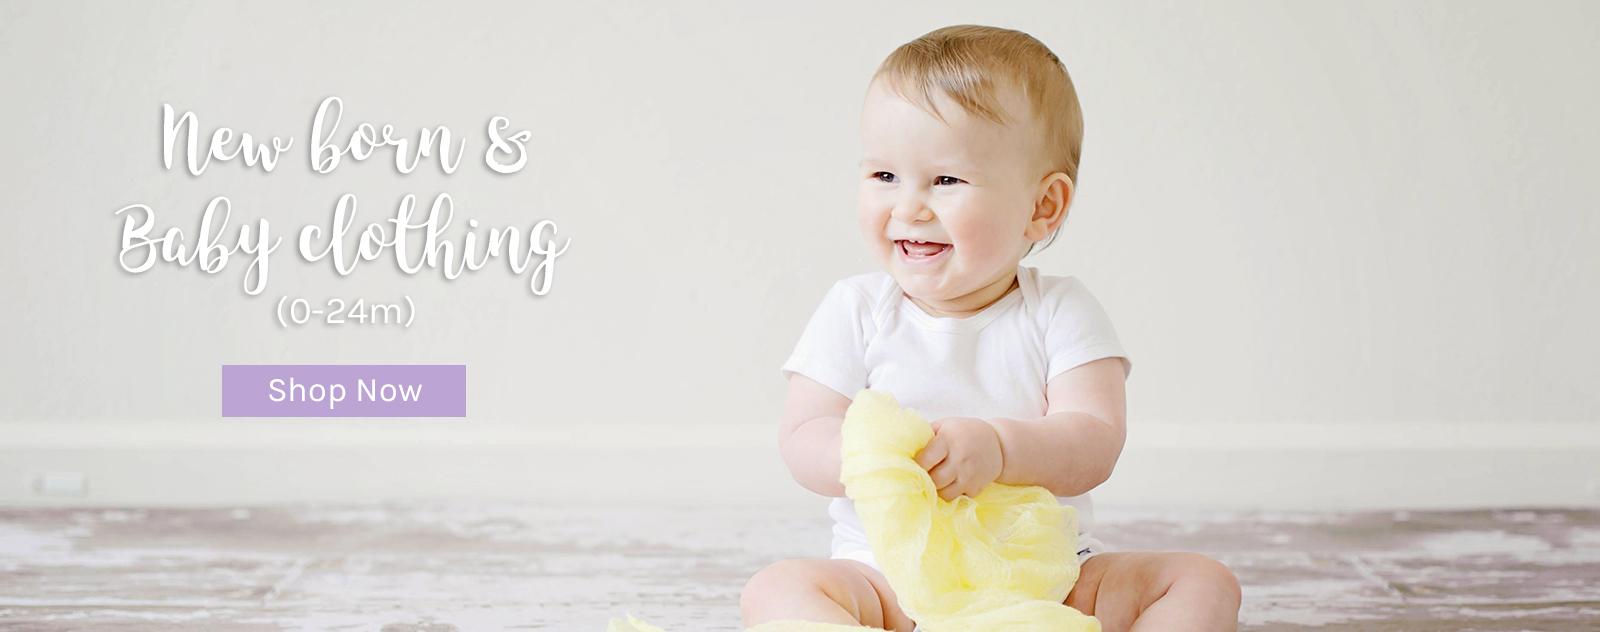 New born & Baby clothing Category